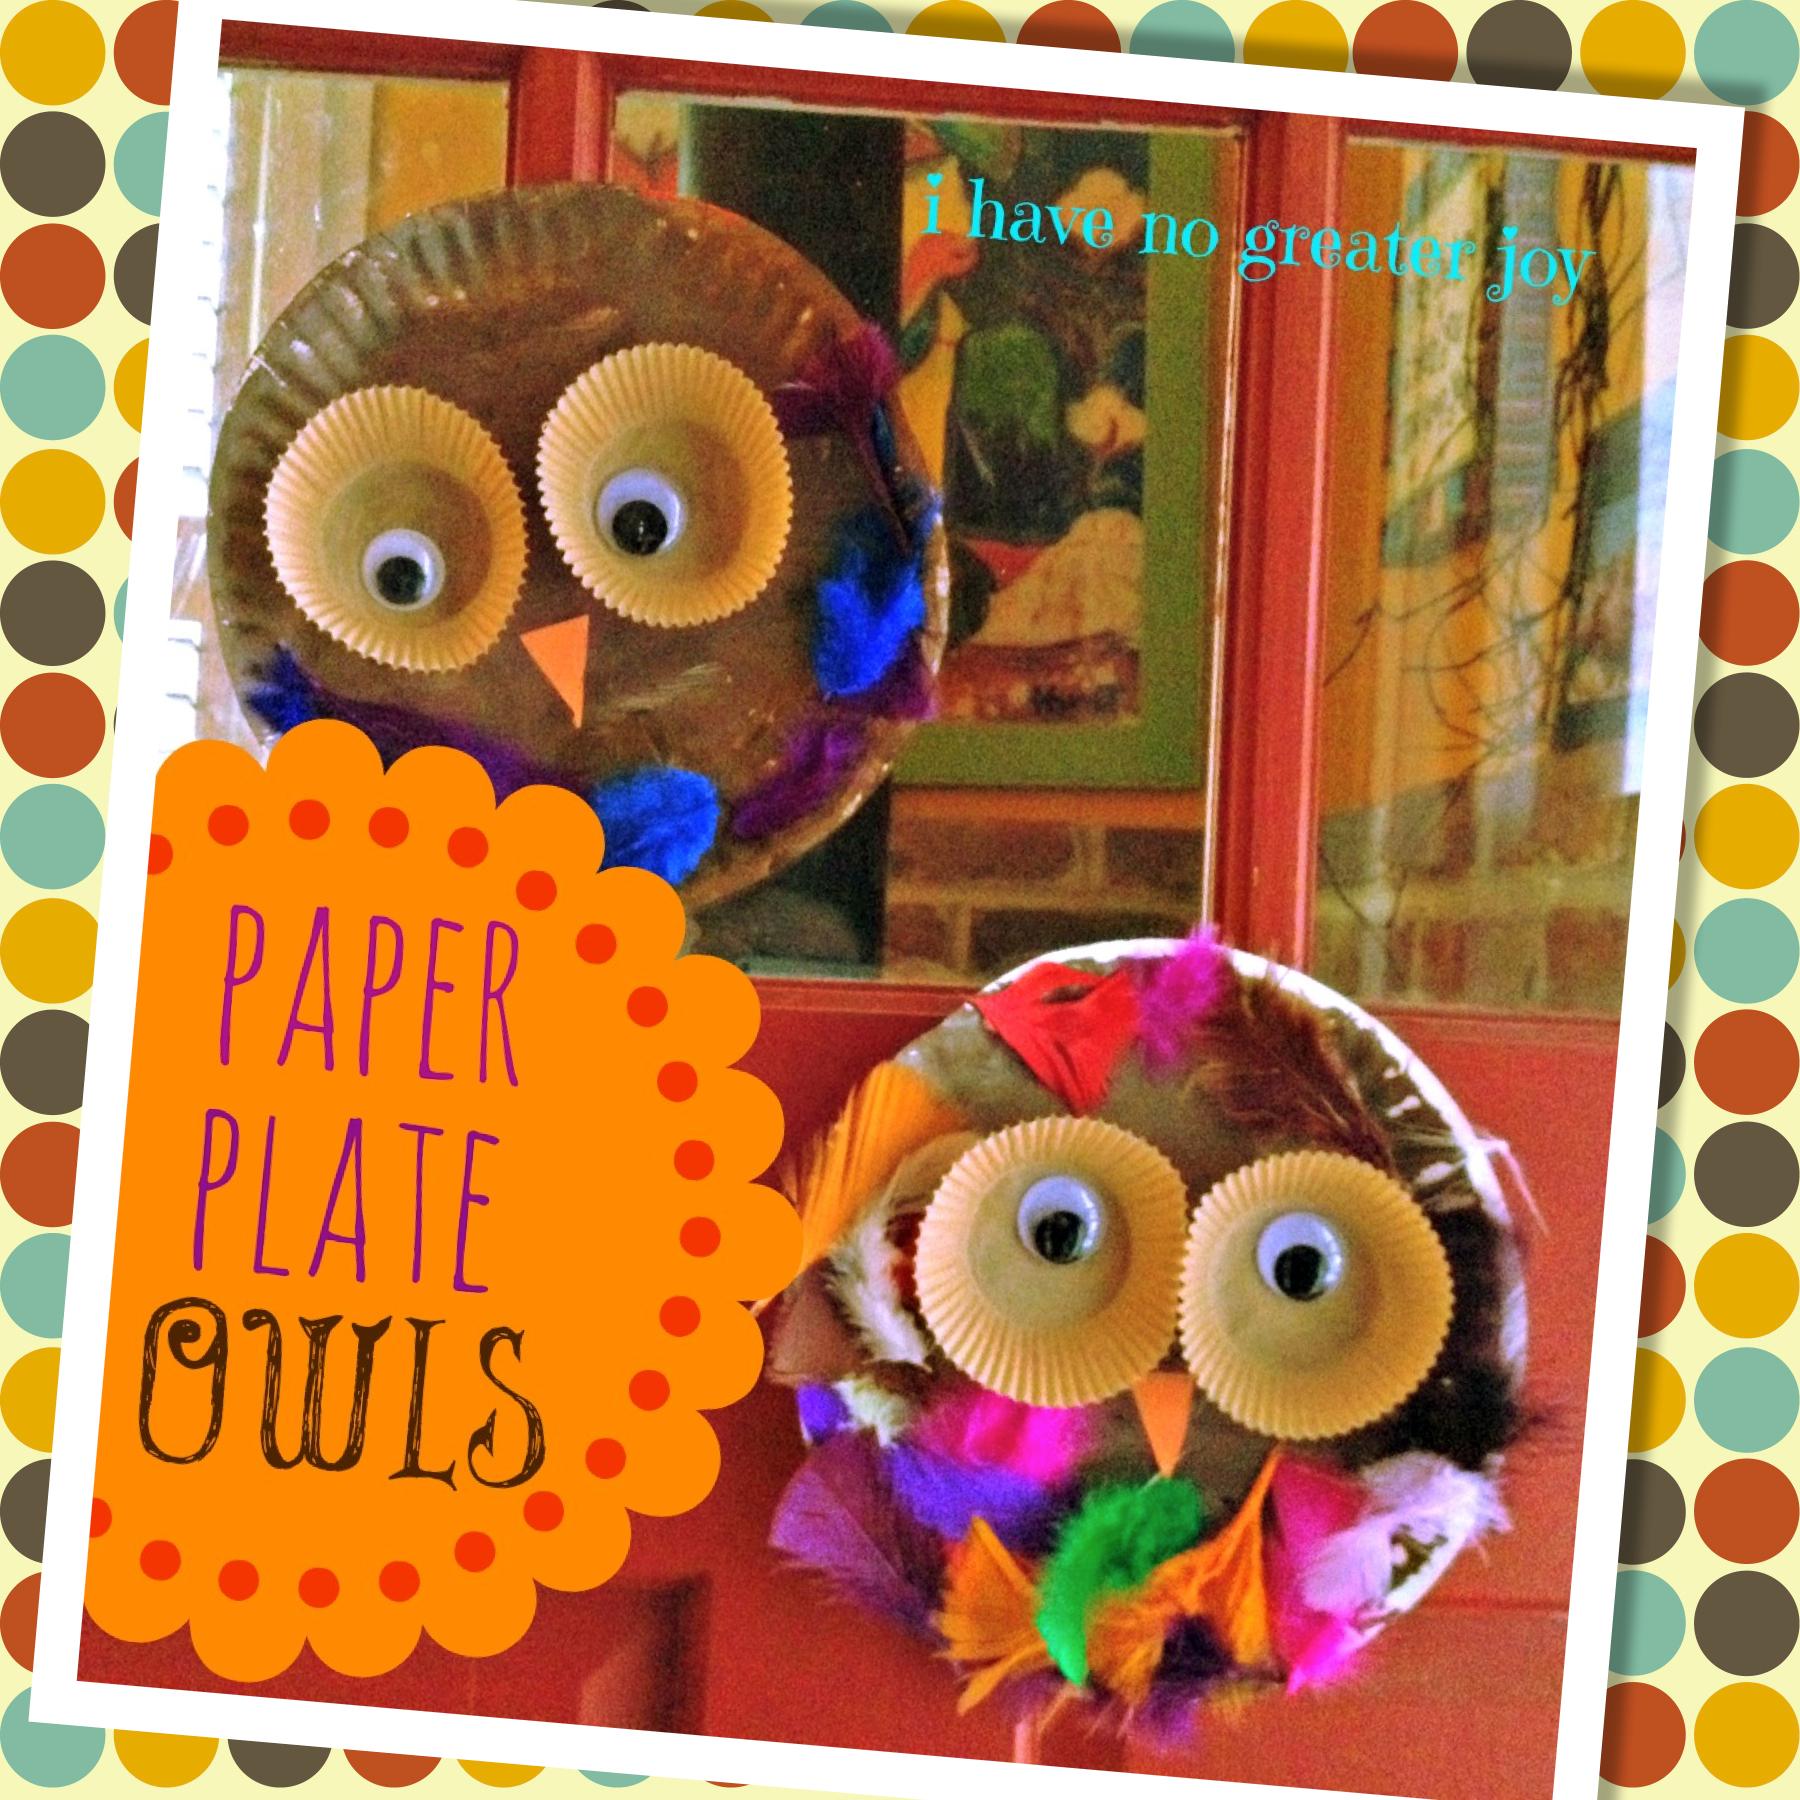 fall owls door  sc 1 st  i have no greater joy - WordPress.com & Paper Plate Owls | i have no greater joy